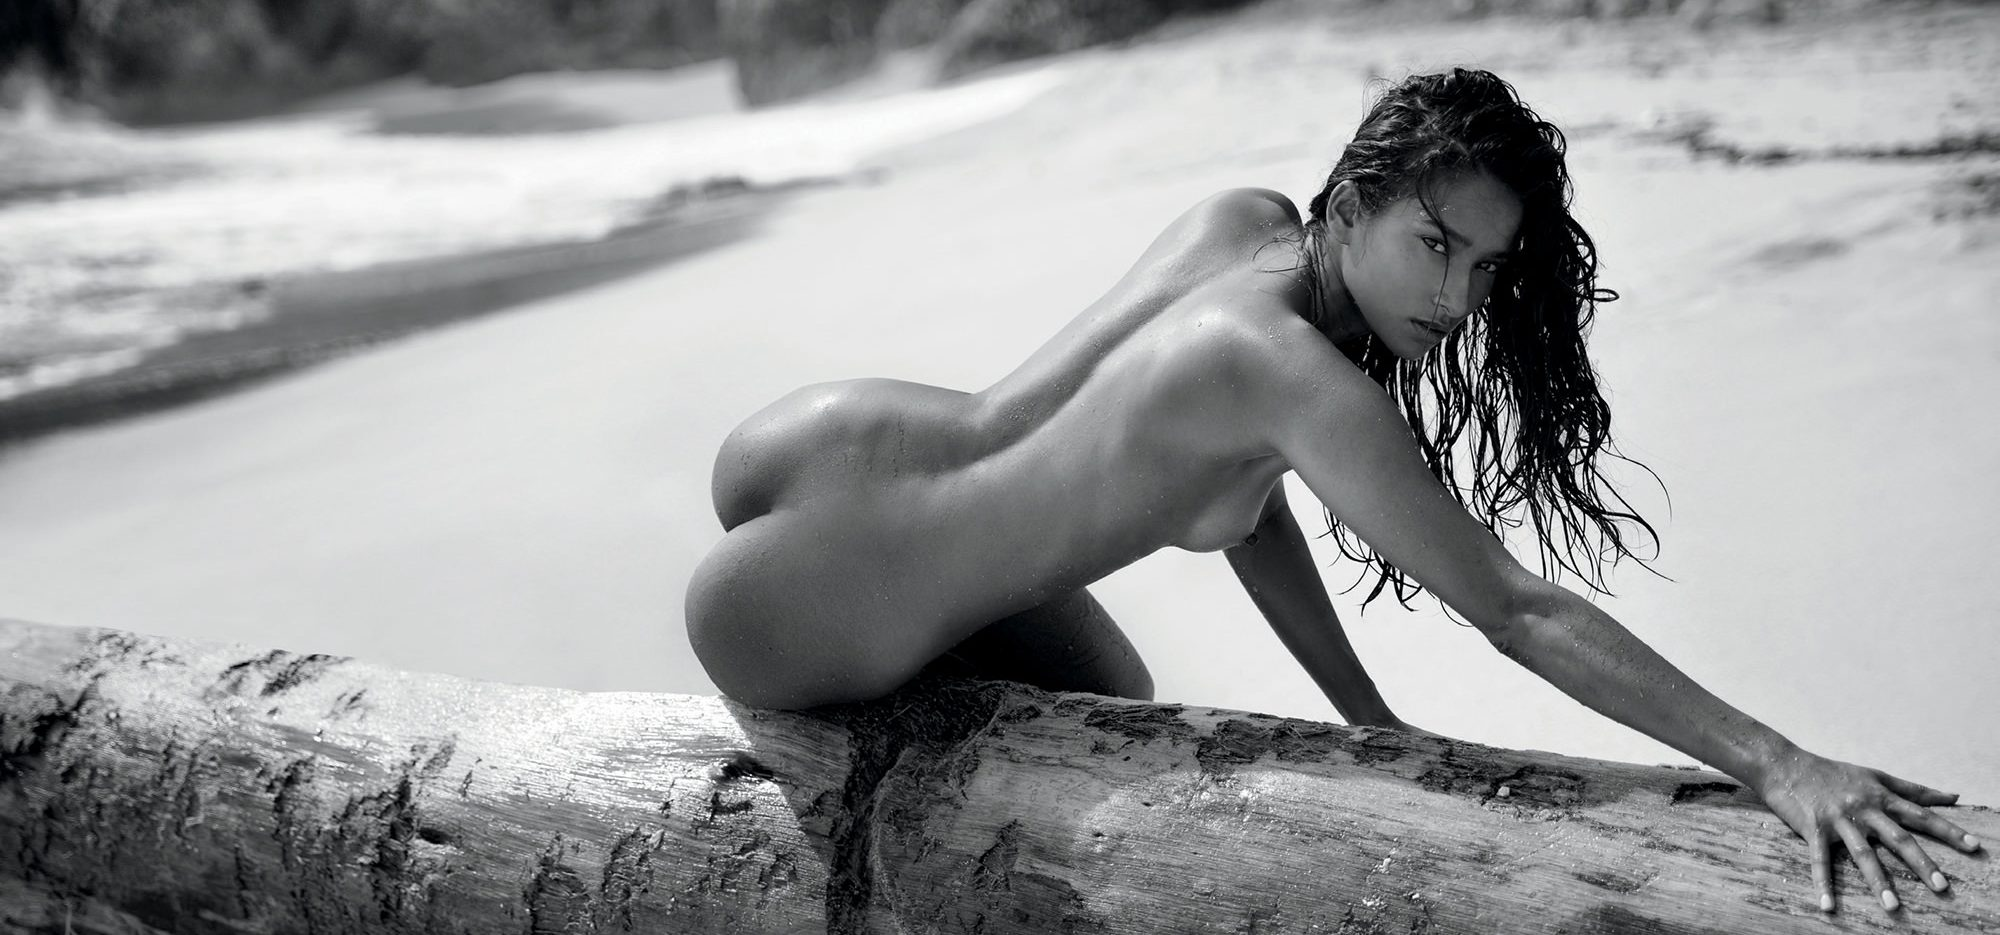 Light skinnedgranny nude, muslim women hot big boob naked image